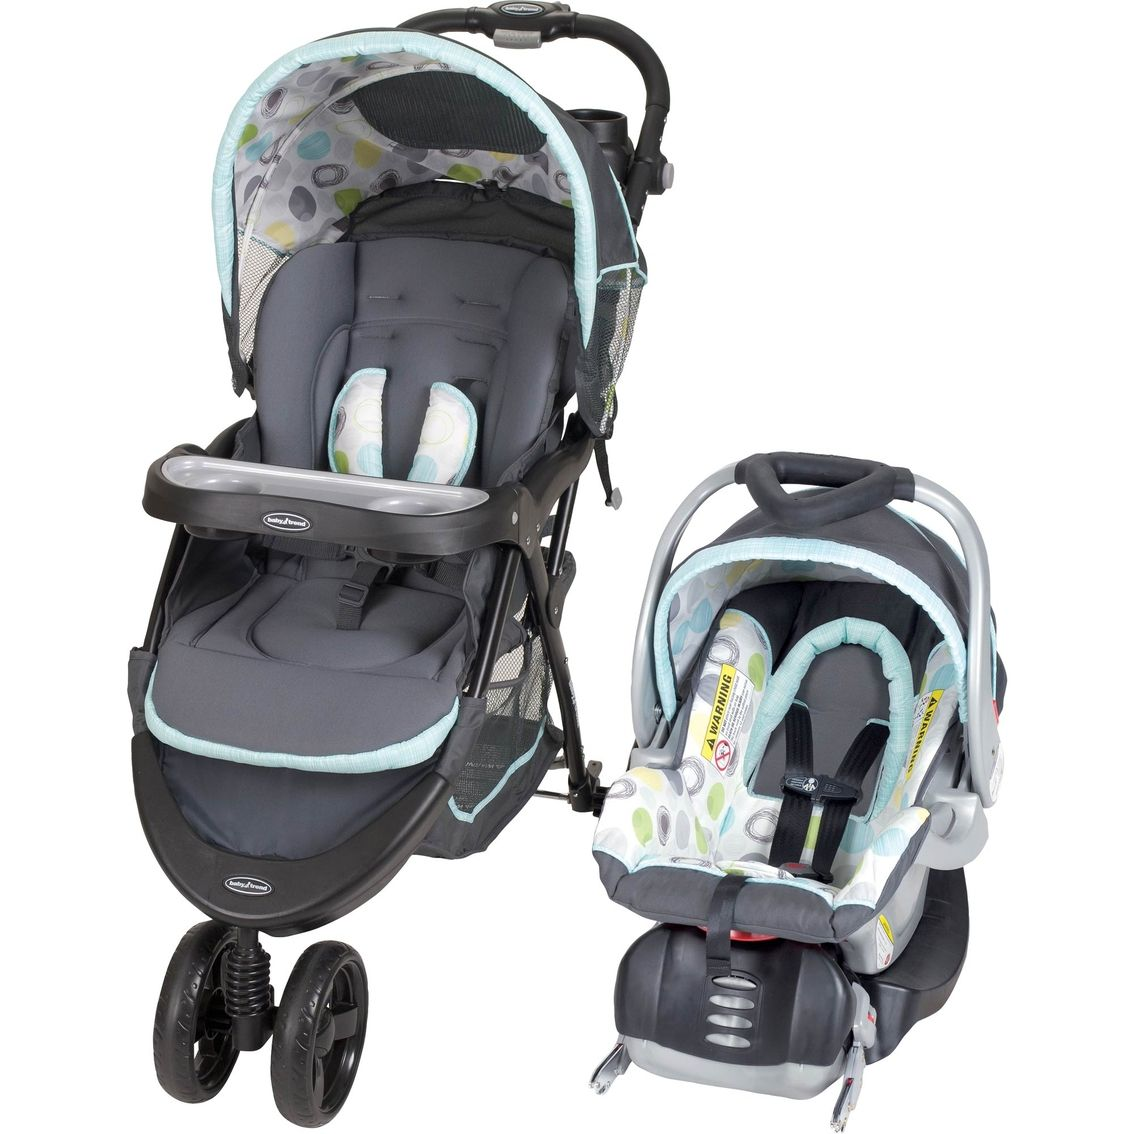 Target Britax Car Seat Travel Bag